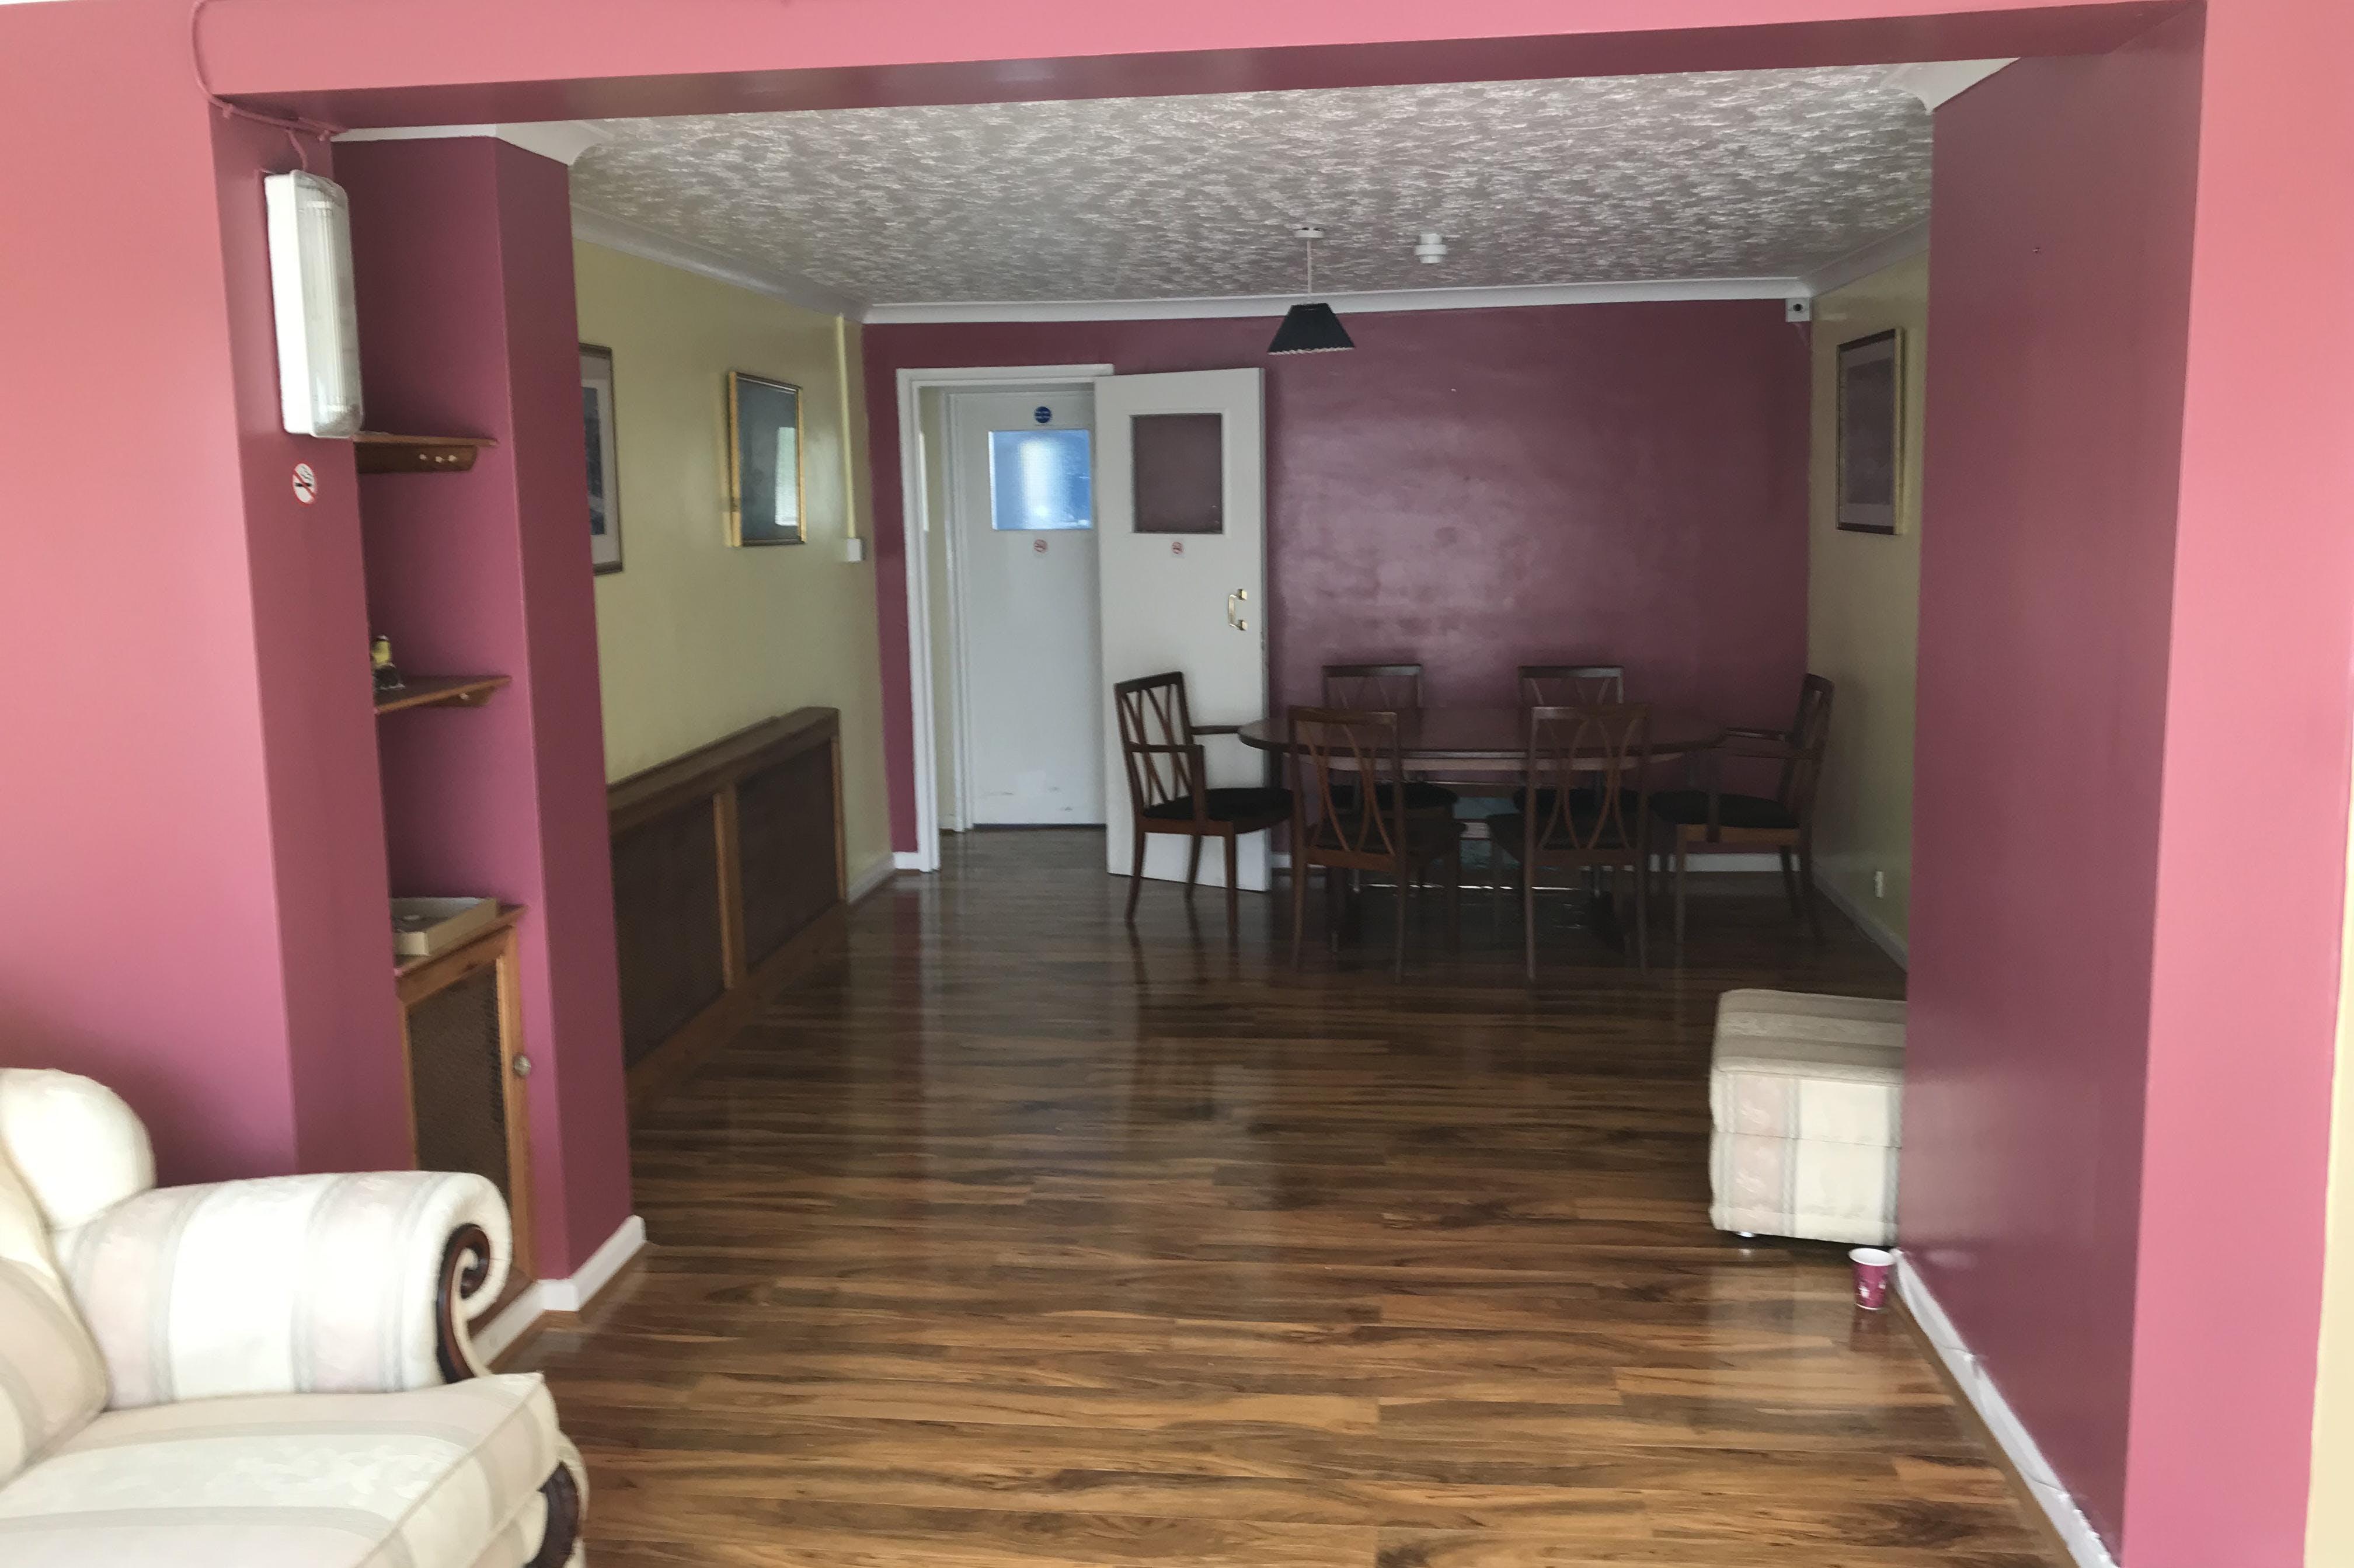 148 De La Warr Road, Bexhill On Sea, Residential For Sale - IMG_9605.JPG